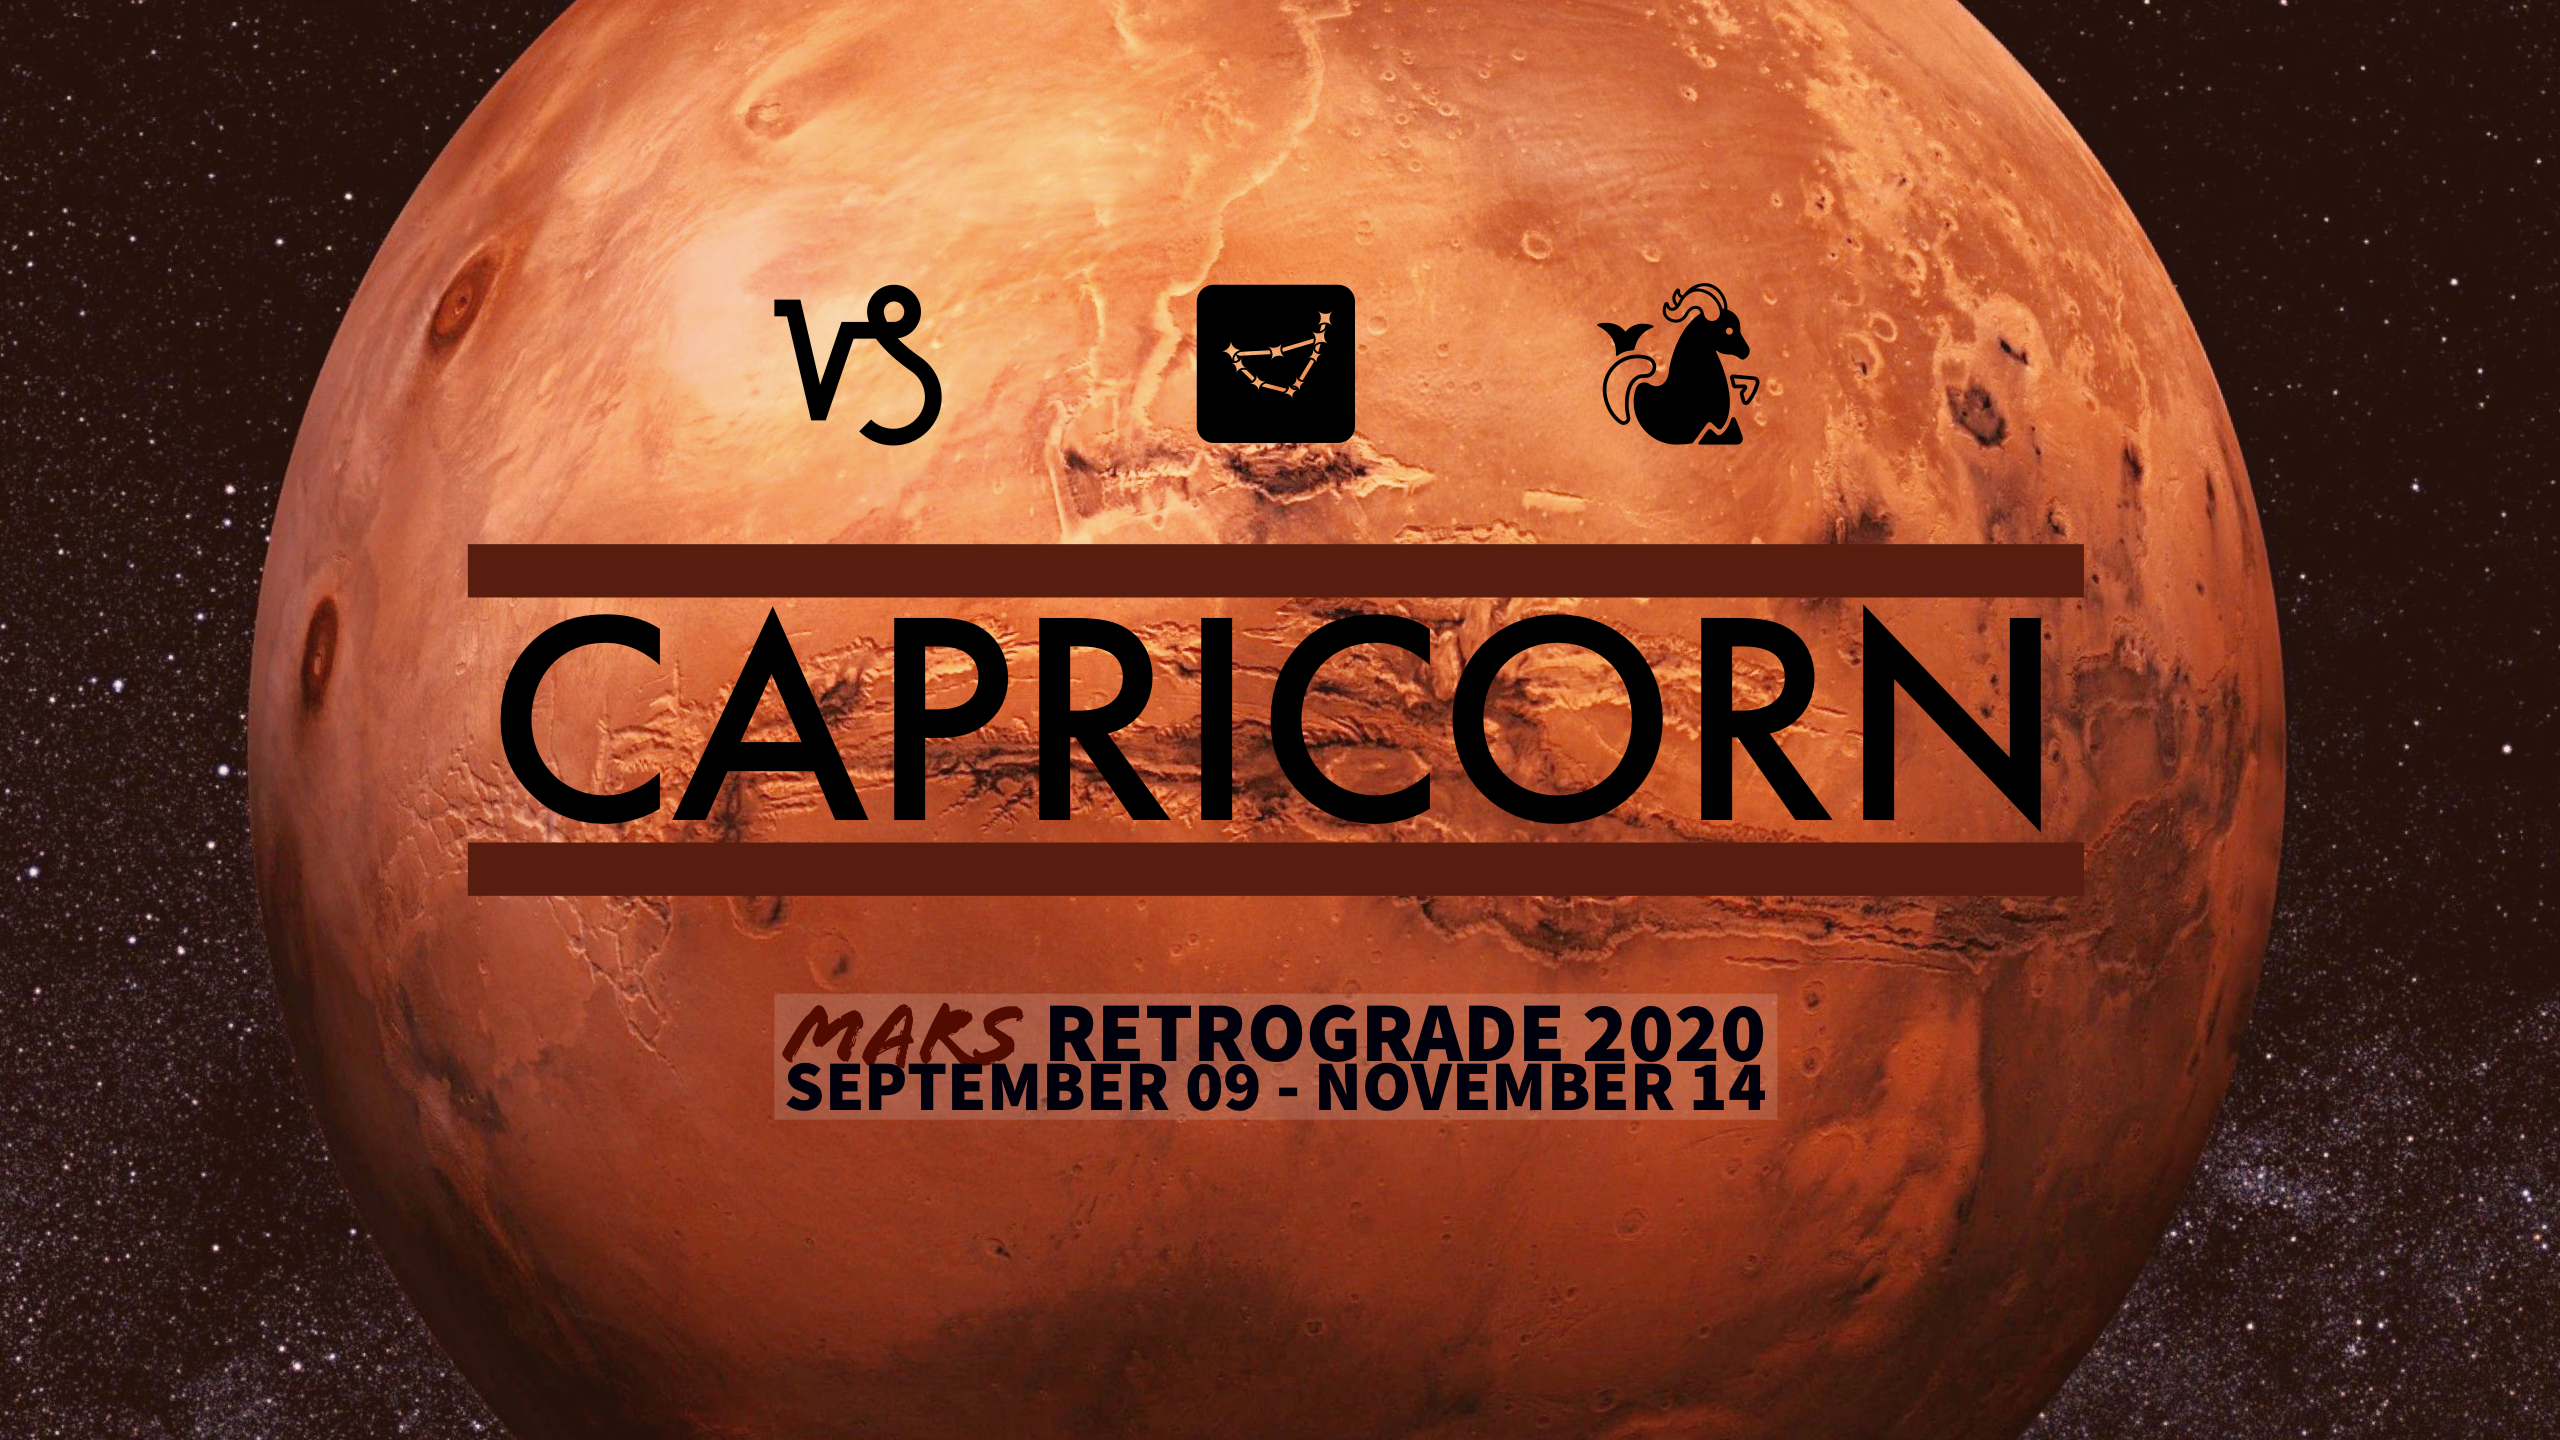 2020 Mars Retrograde:10 Capricorn